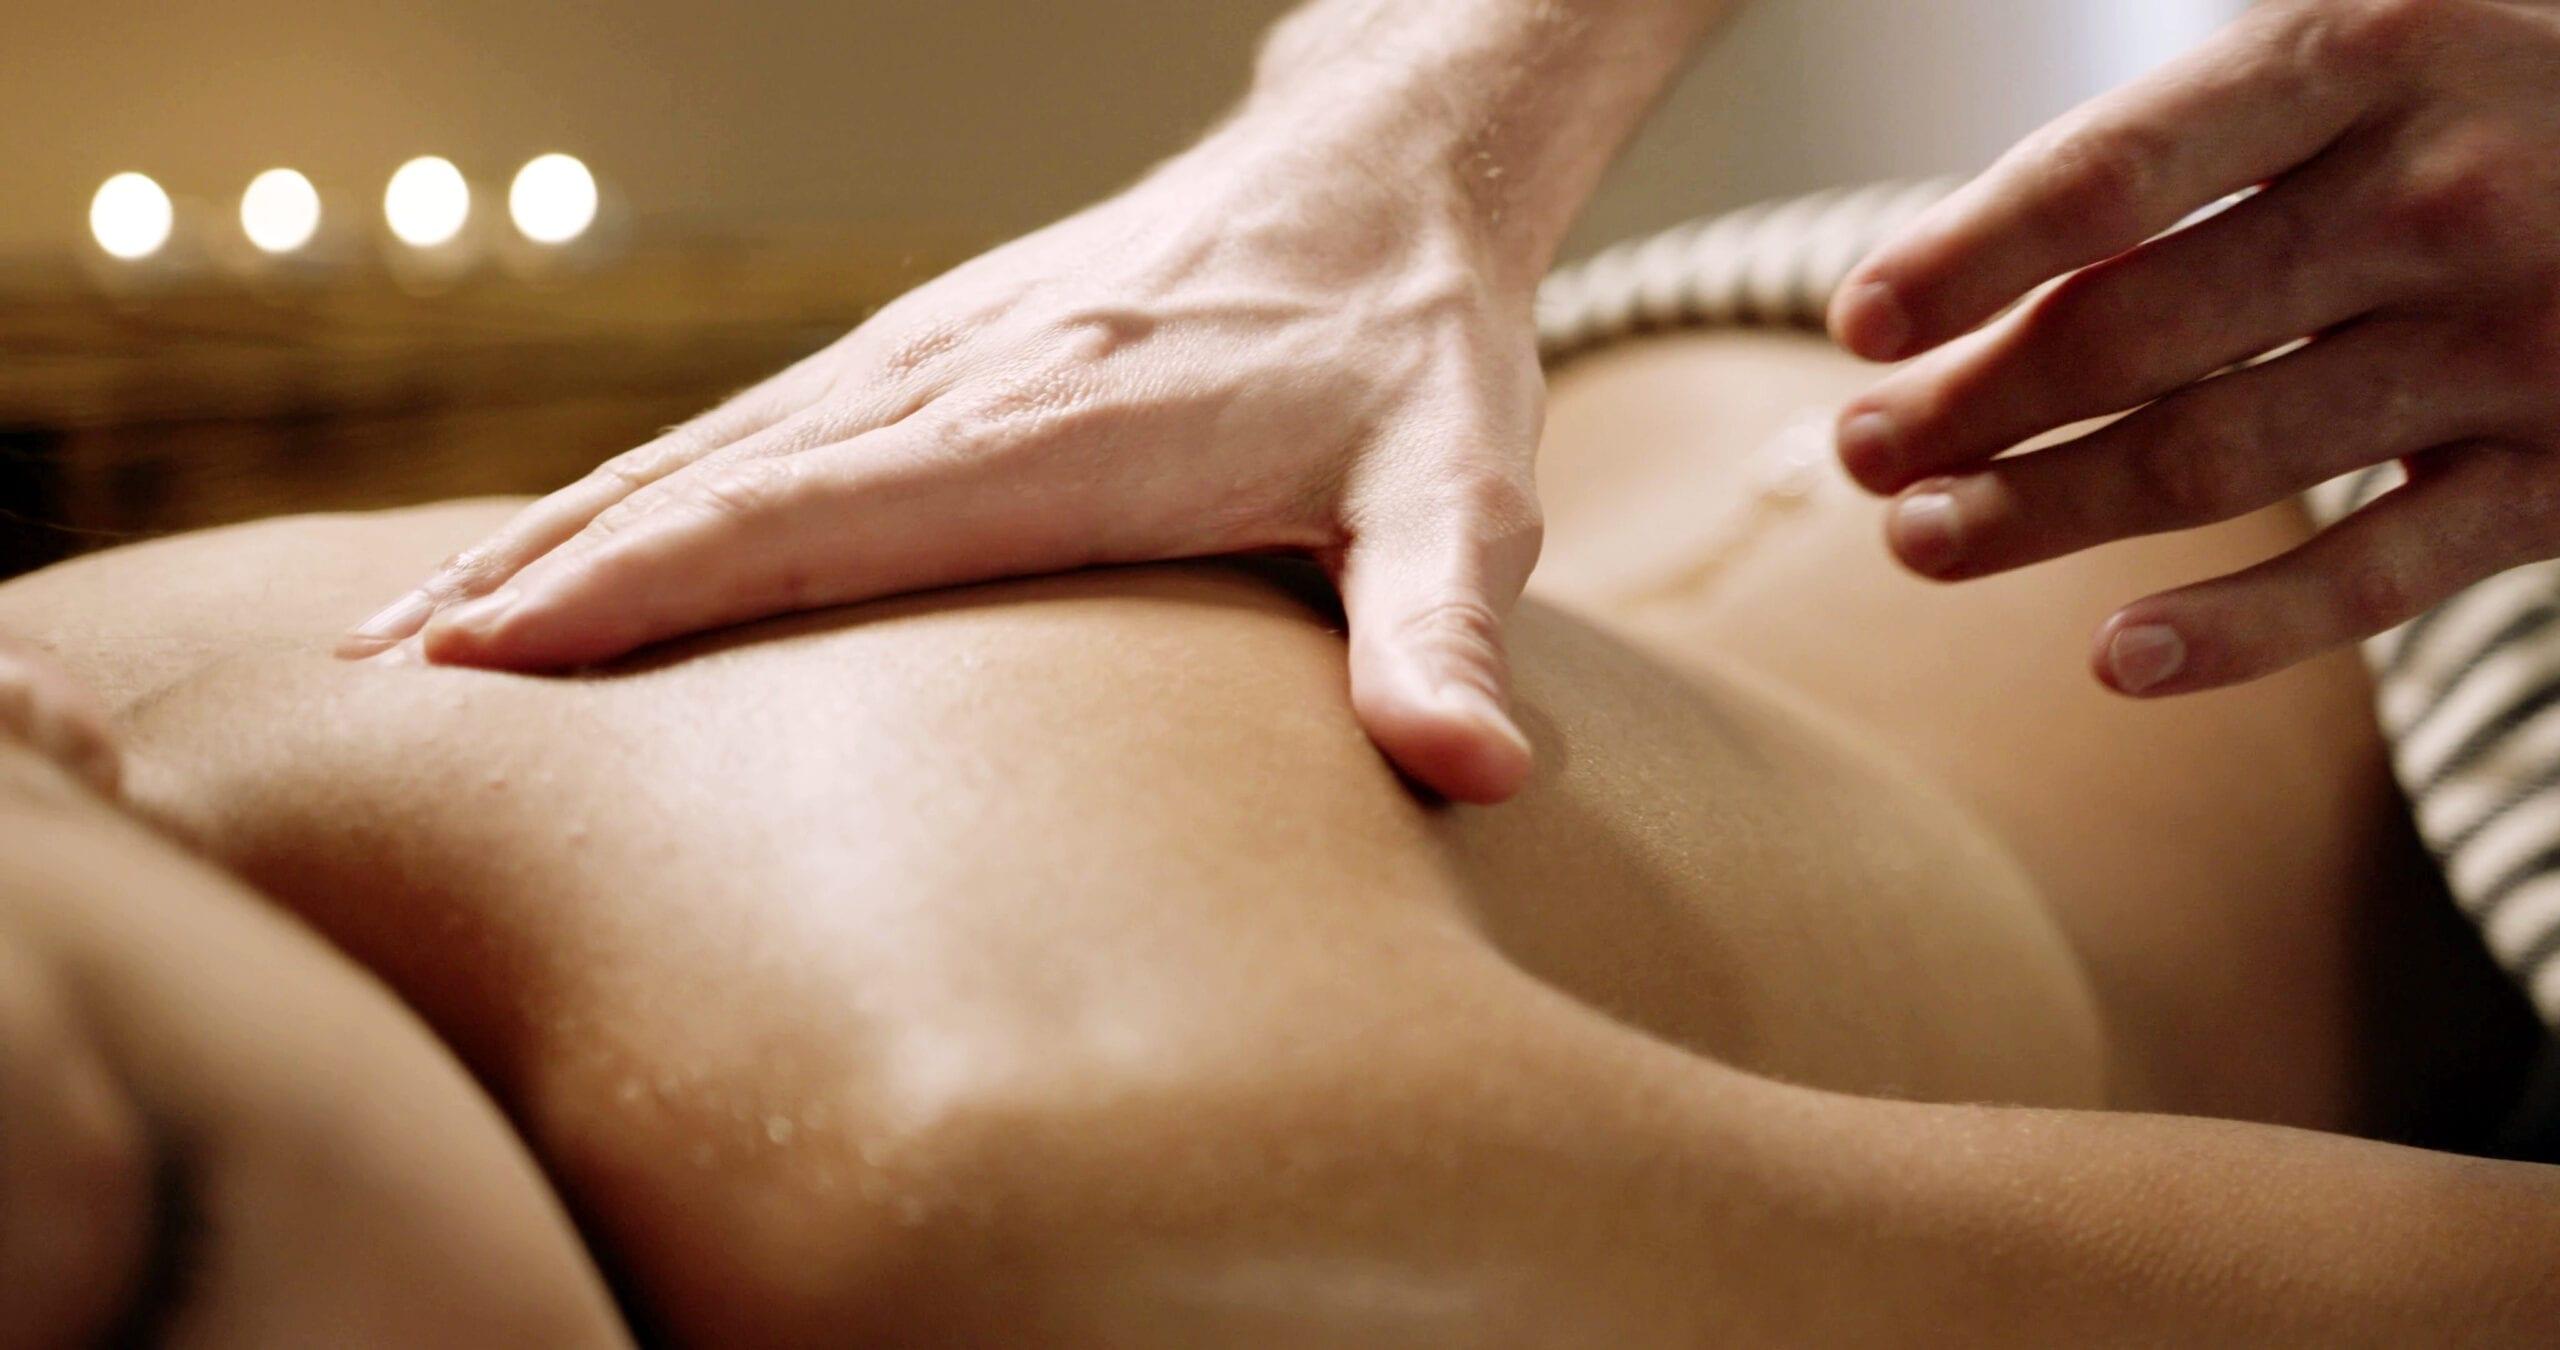 Massagegreb på ryg